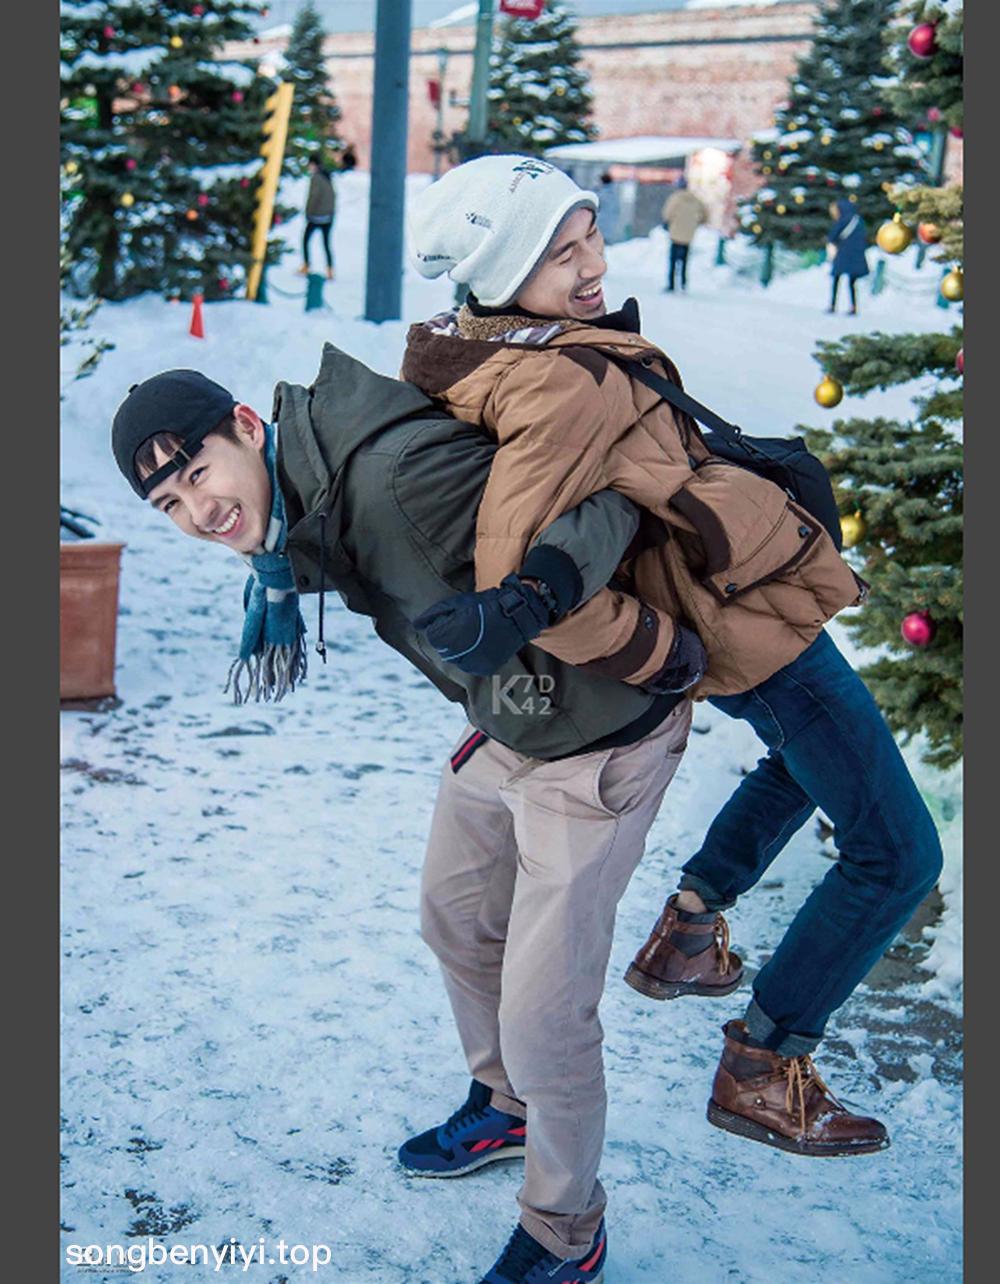 WHOSEMAN NO.13阿部&安東尼-追尋白色戀人的浪漫【藝術全見版】【ebook】-06.png